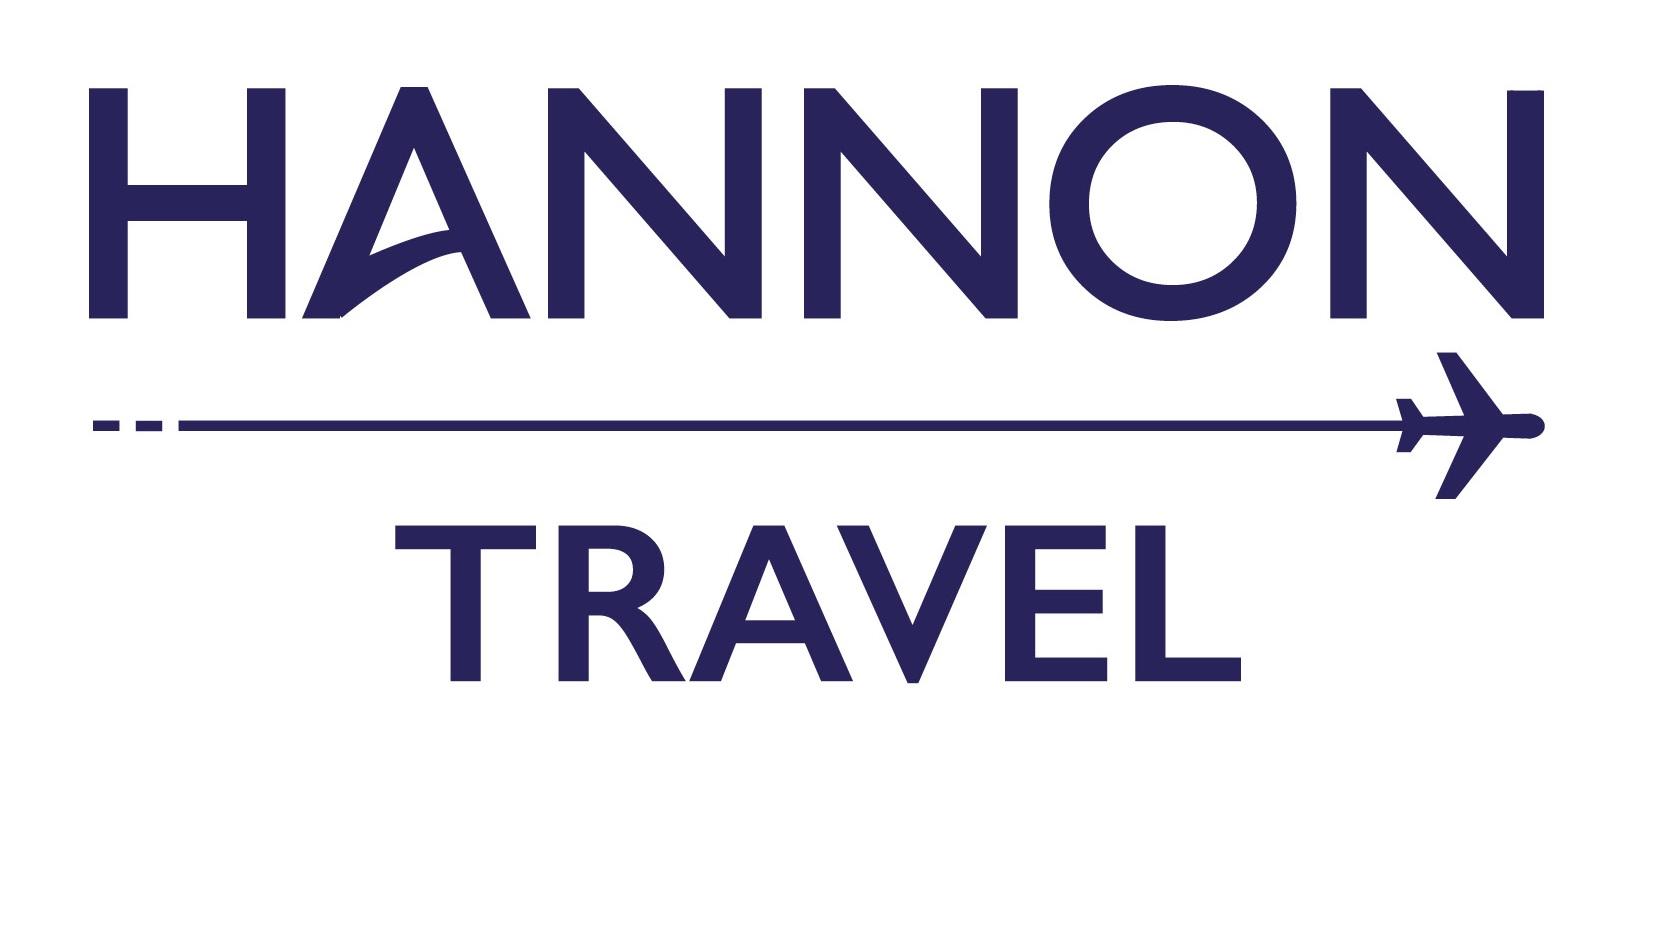 Hannon Travel.jpg